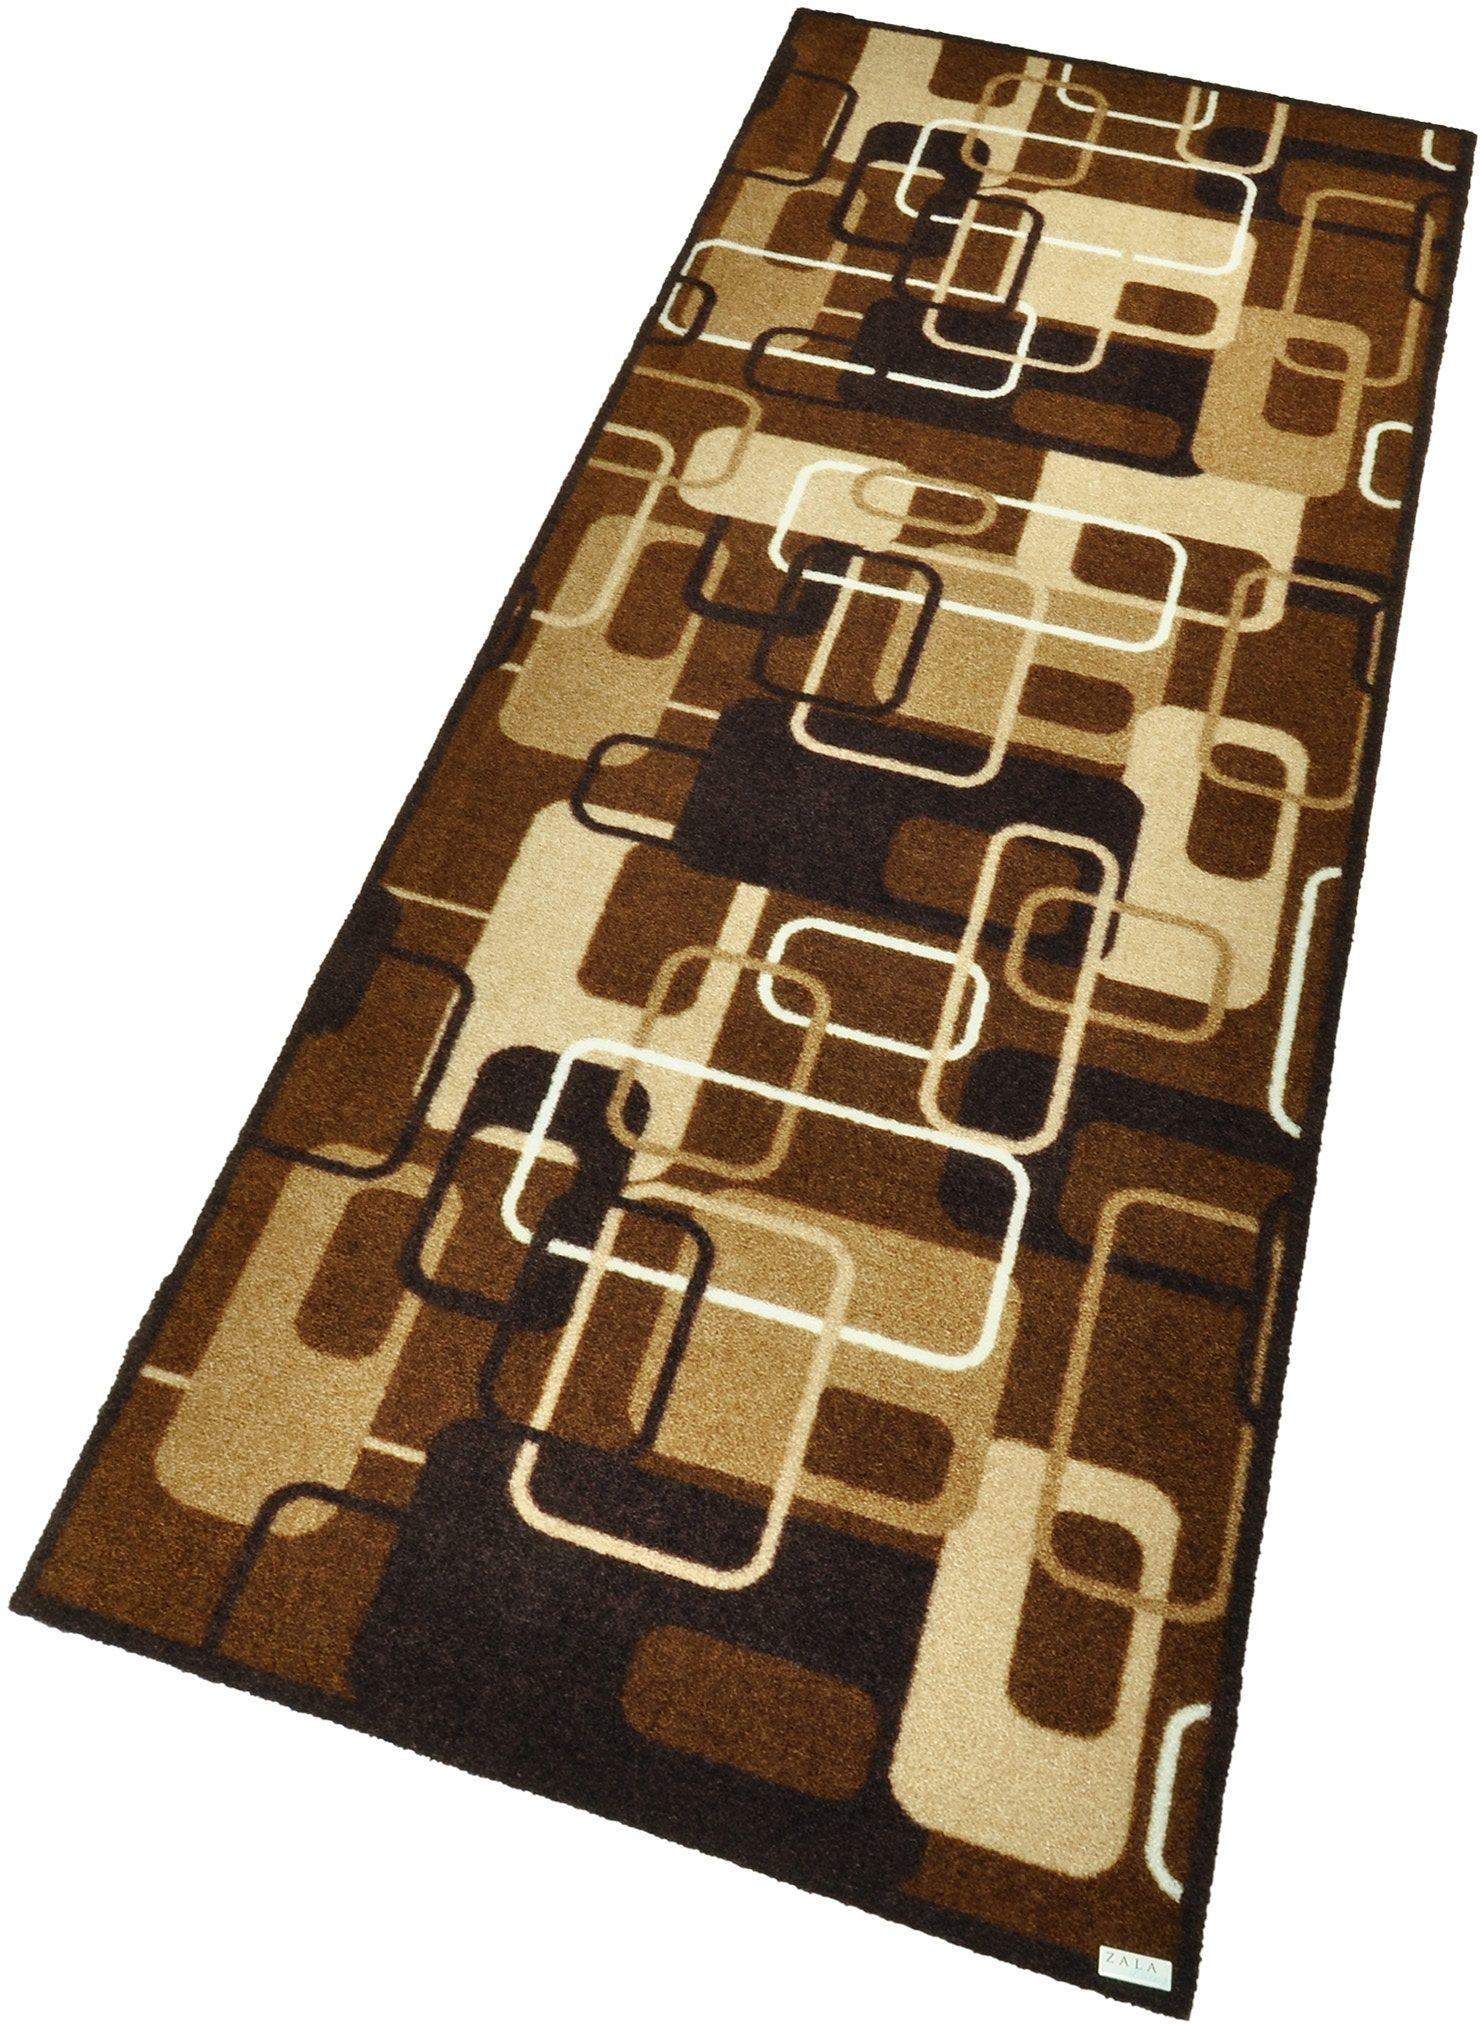 Läufer Retro HANSE Home rechteckig Höhe 9 mm maschinell gewebt | Heimtextilien > Teppiche > Läufer | Braun | Hanse Home